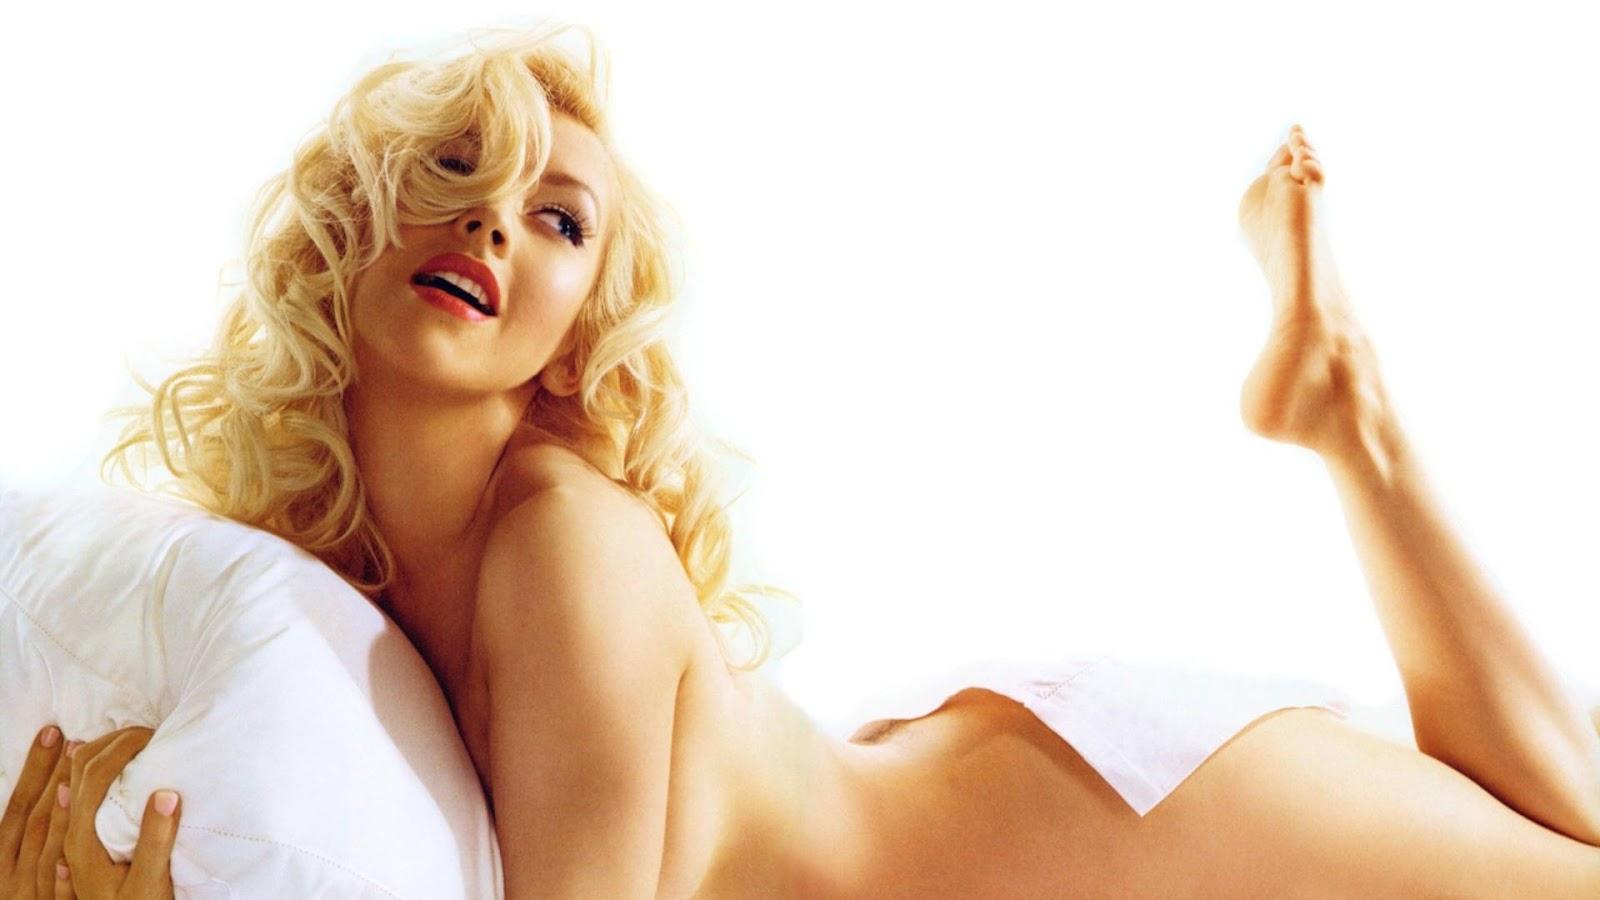 Christina aguilera sexy Fotos